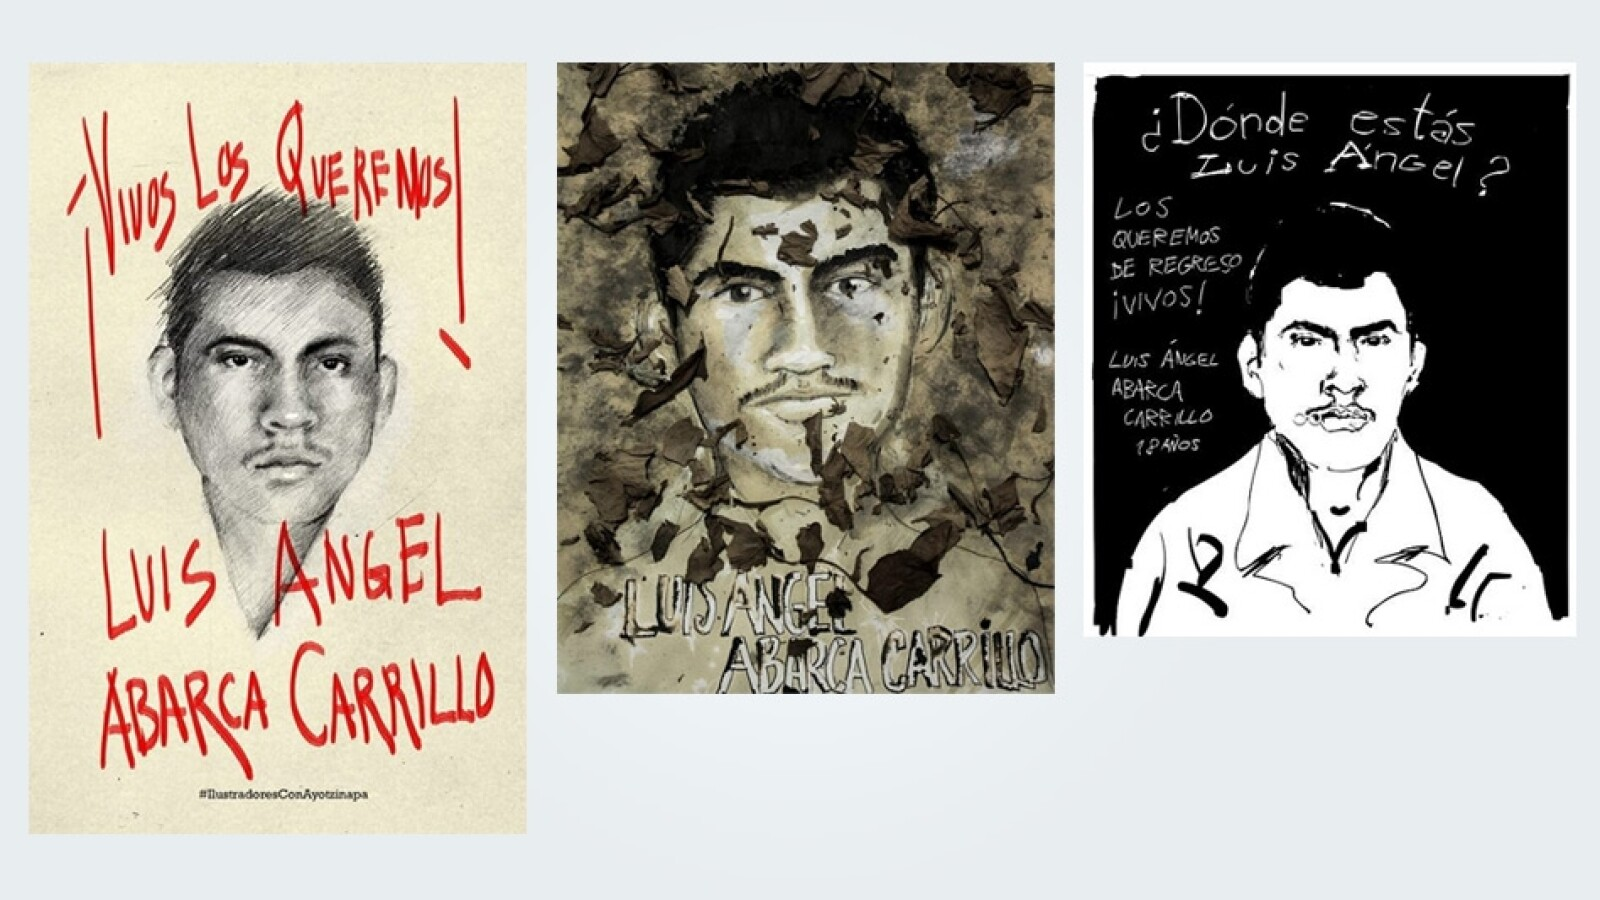 Luis Angel Abarca Ayotzinapa